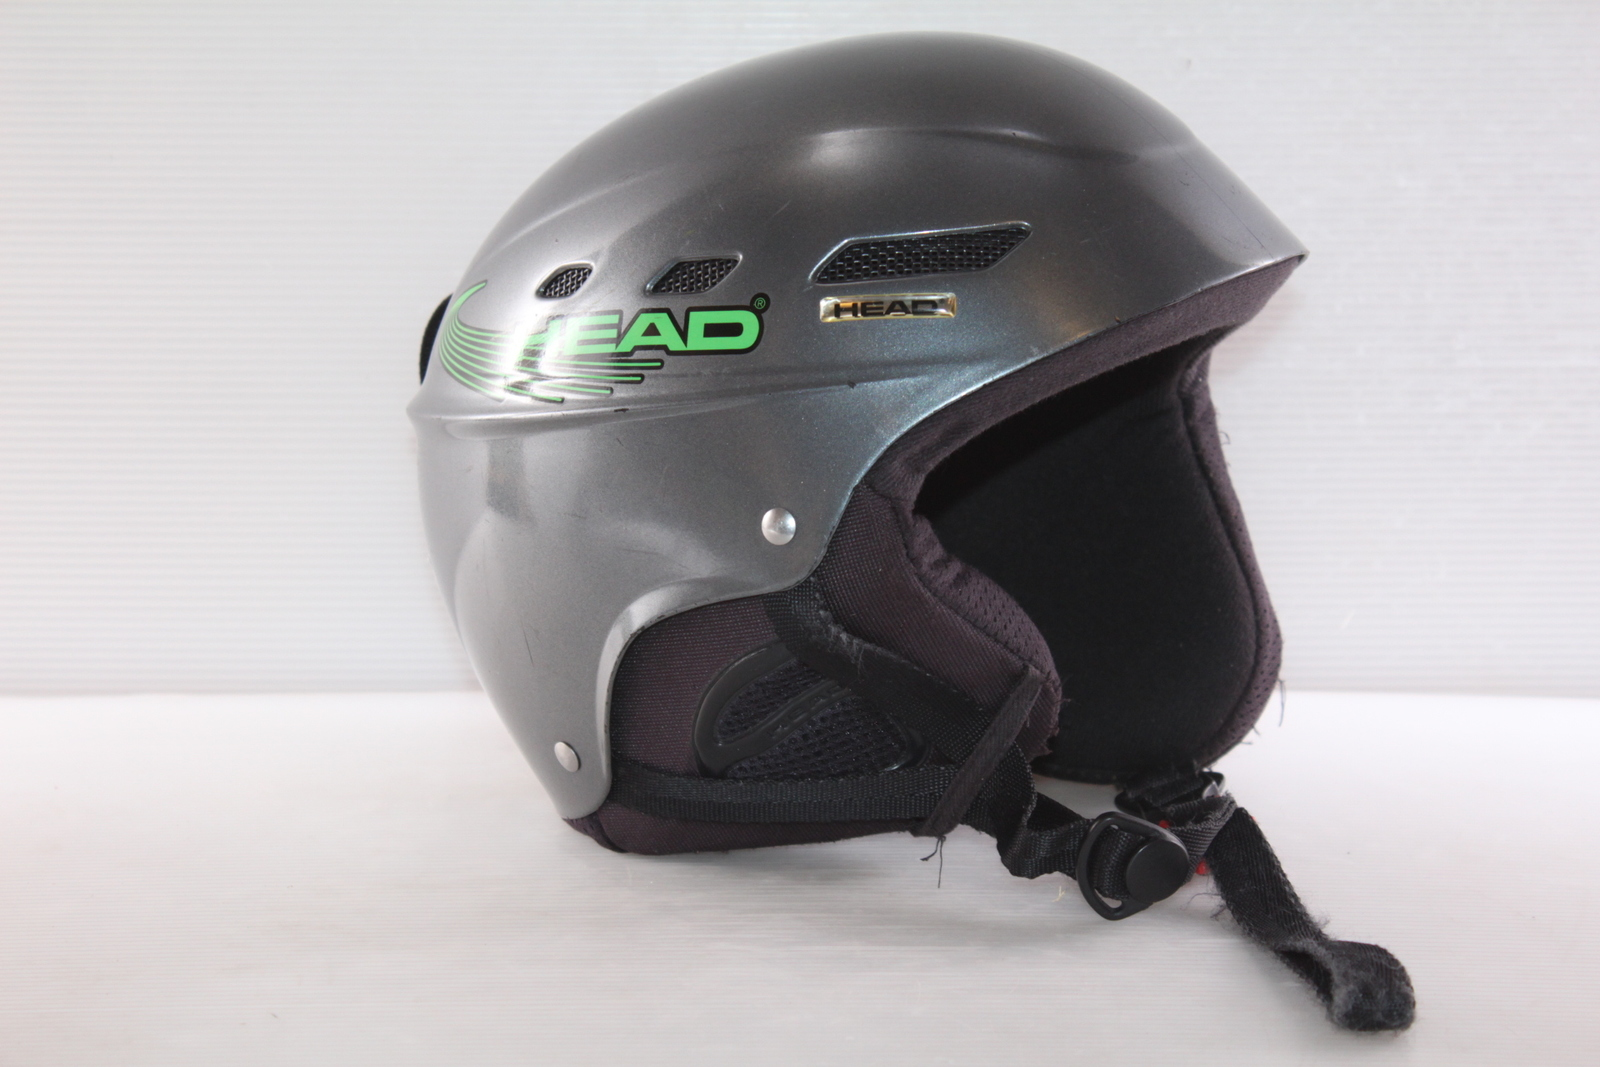 Lyžařská helma Head Rental SR vel. 54